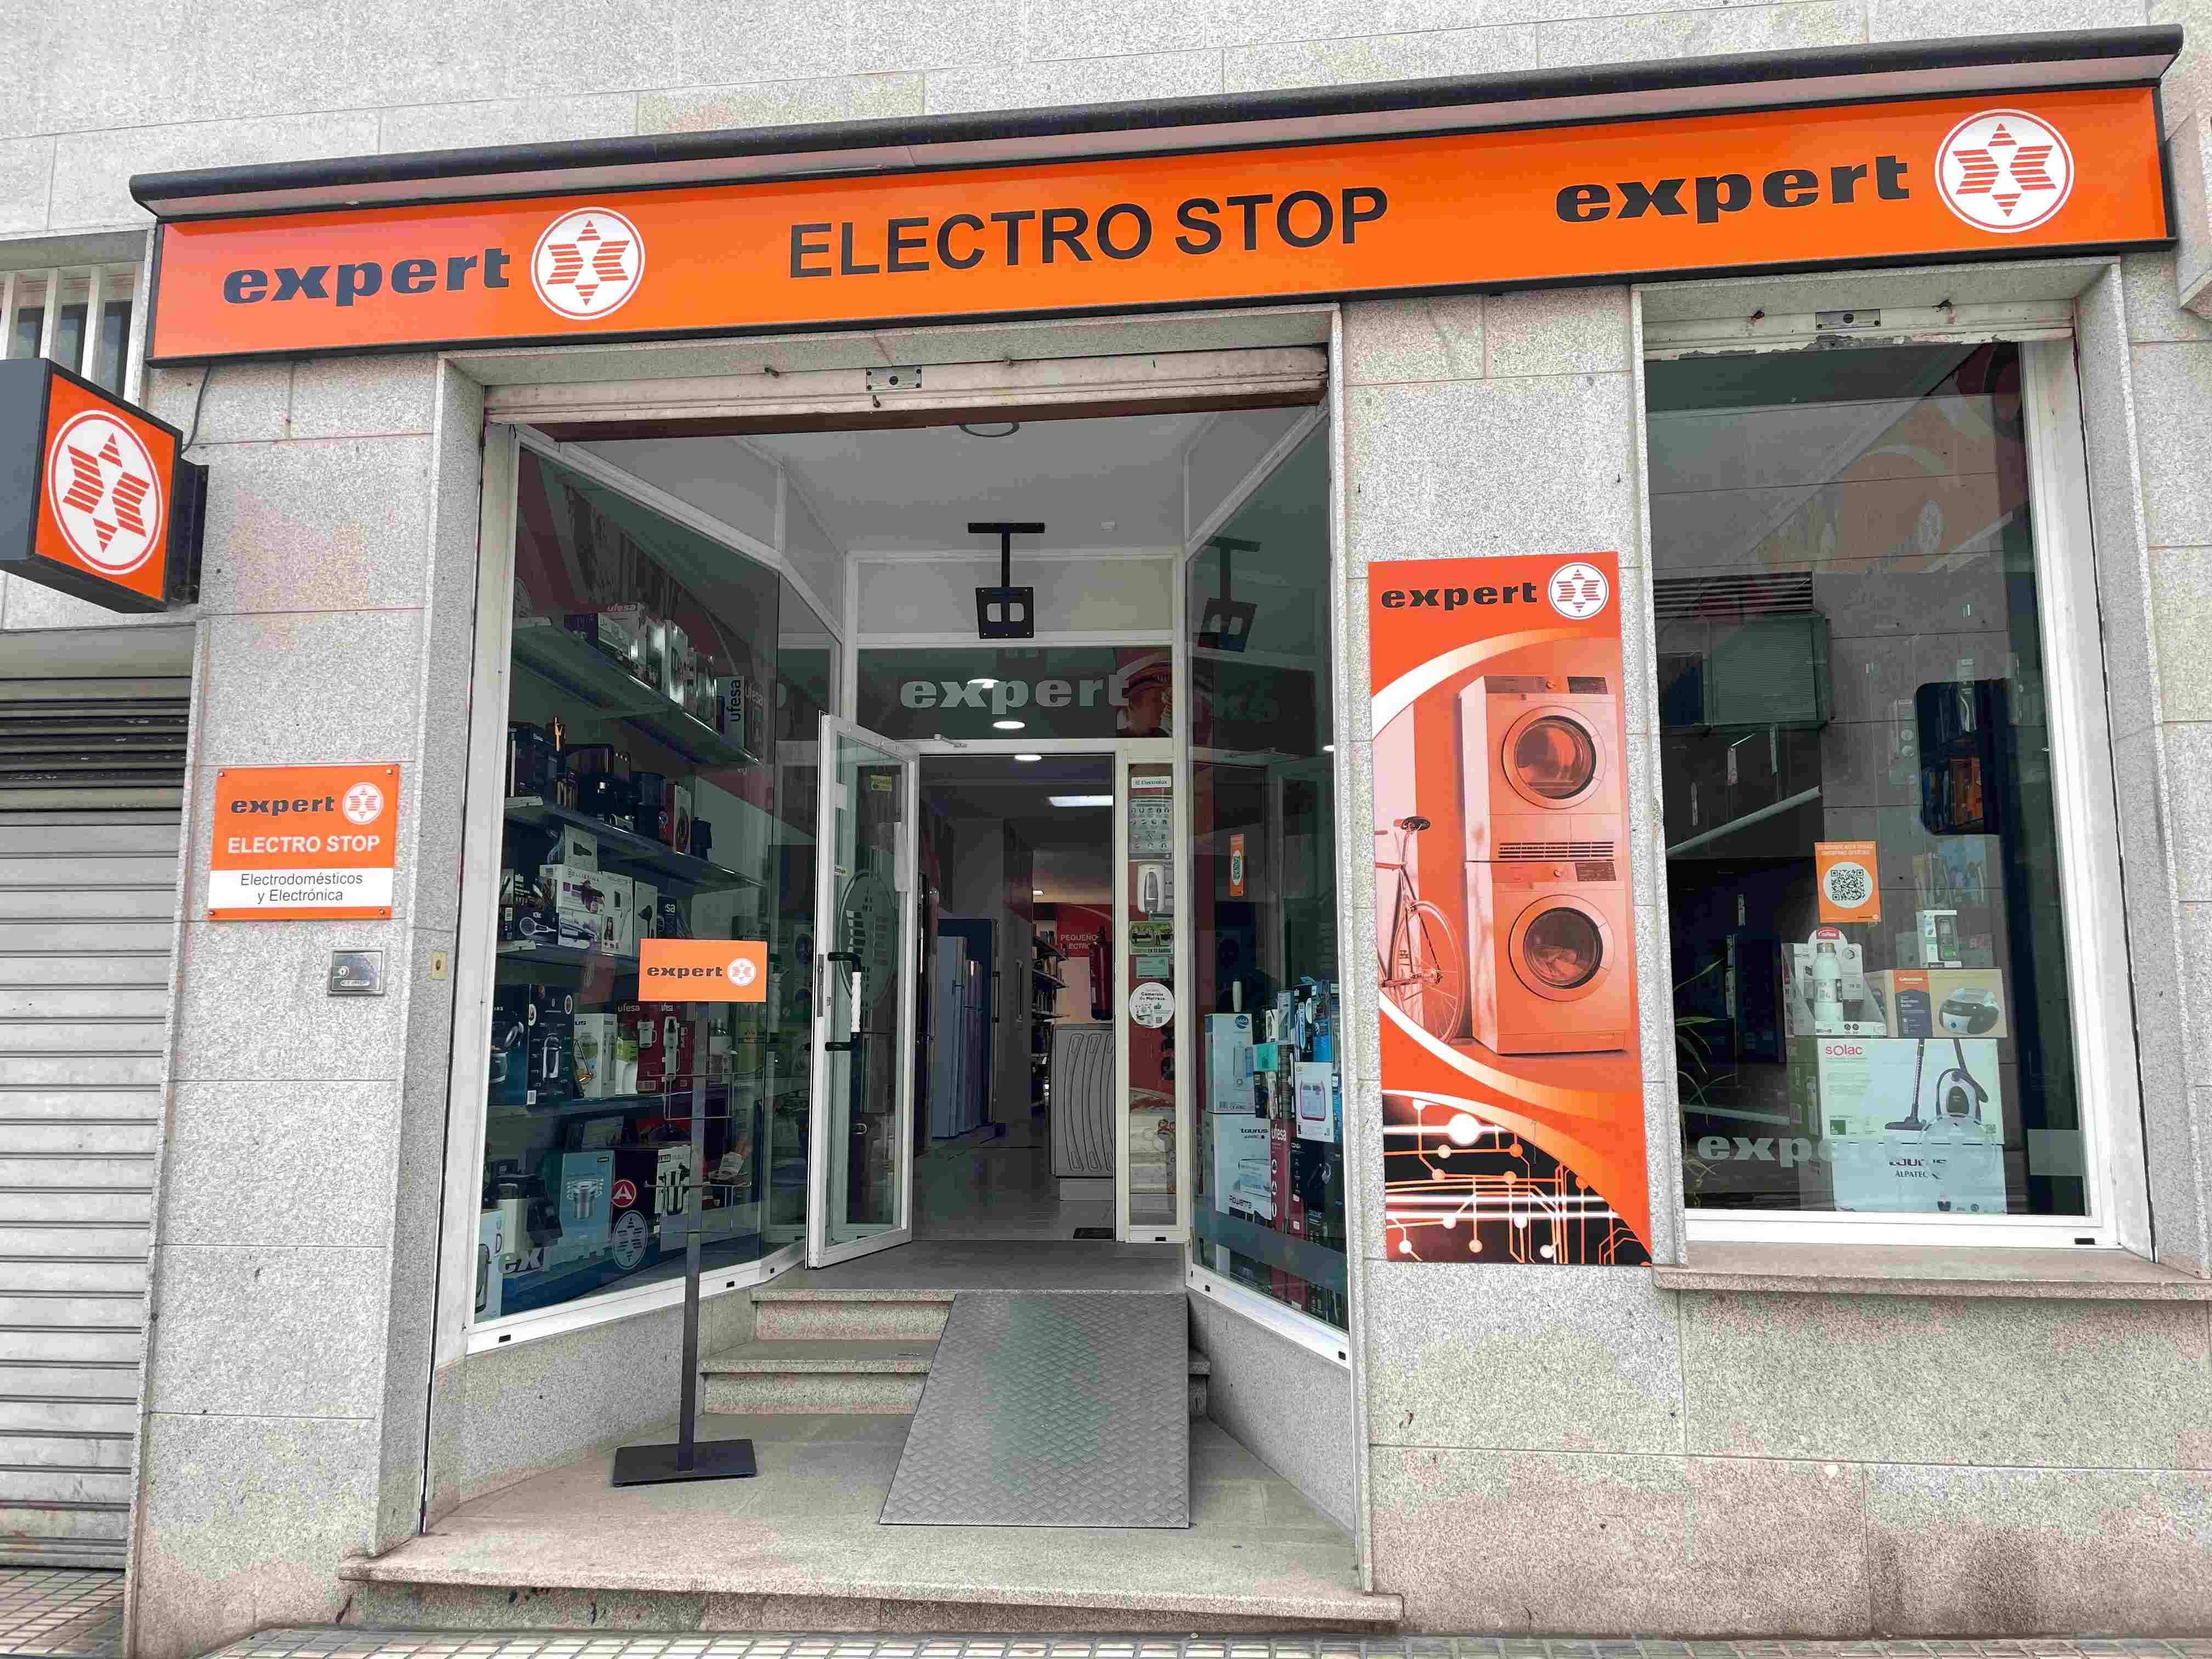 ELECTRO STOP